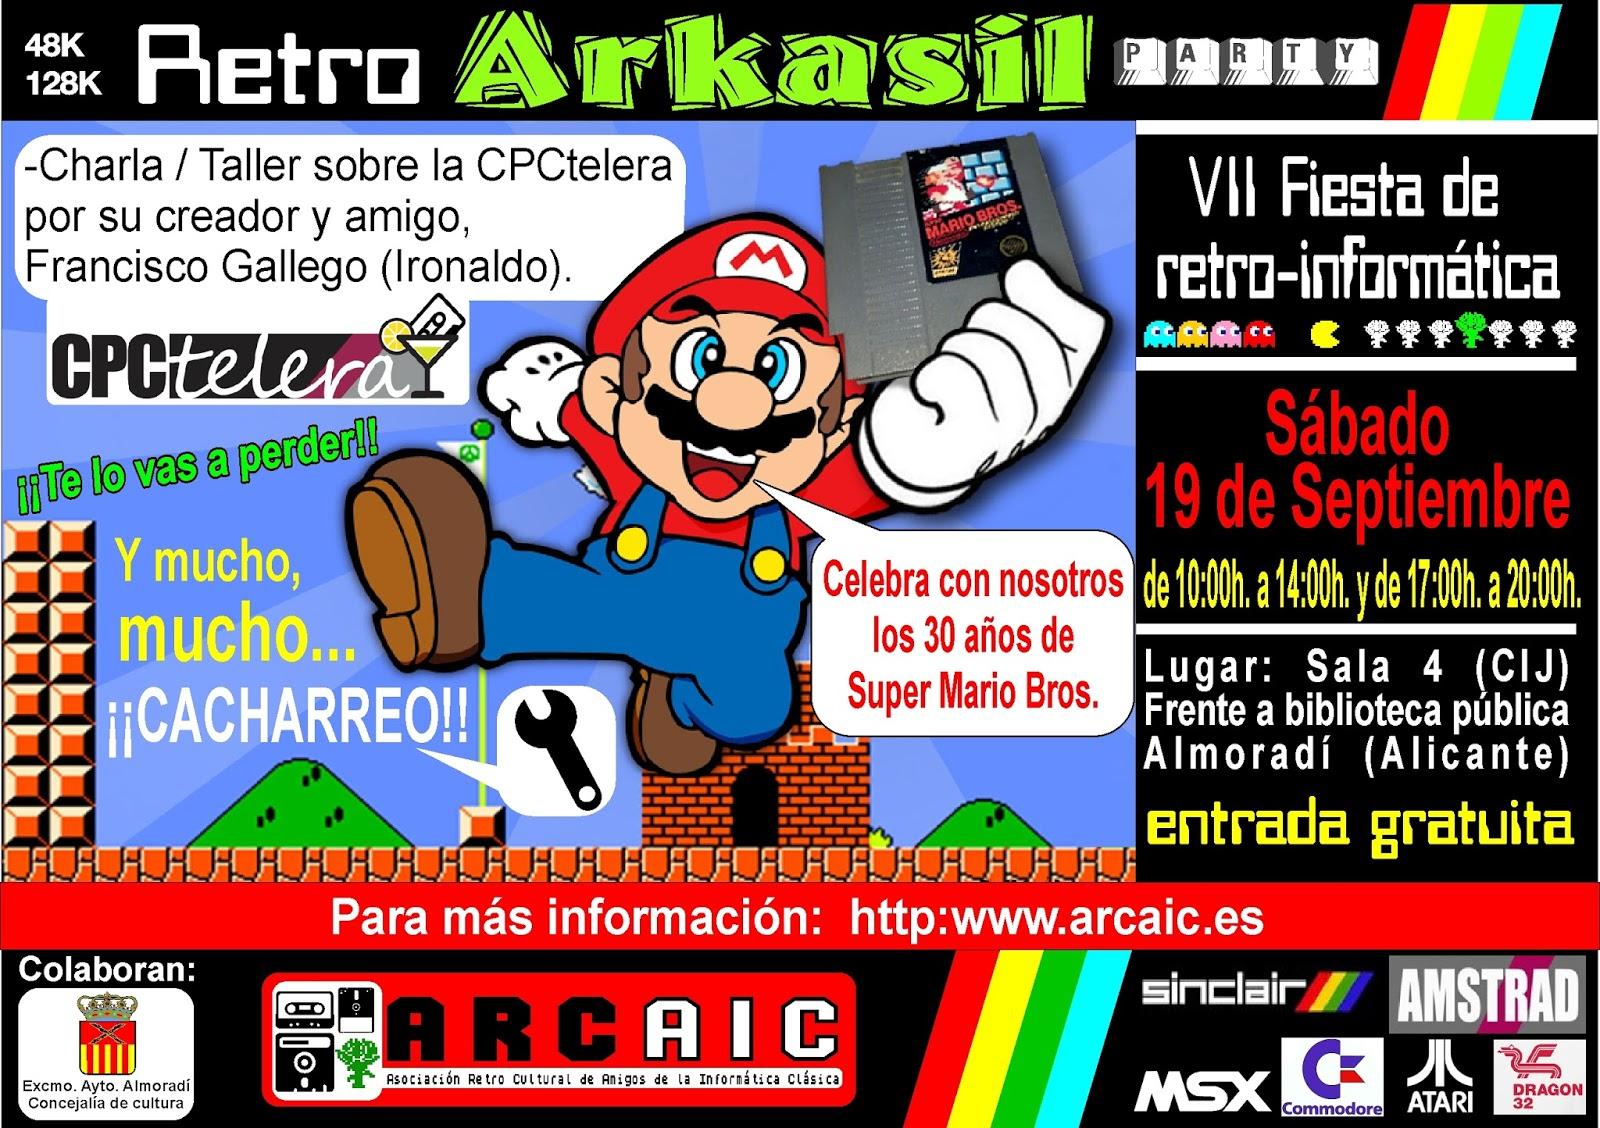 Retro Arkasil Party VII (19 Septiembre) Almoradi RETRO%2BARKASIL%2BPARTY%2B2015%2Bpeq